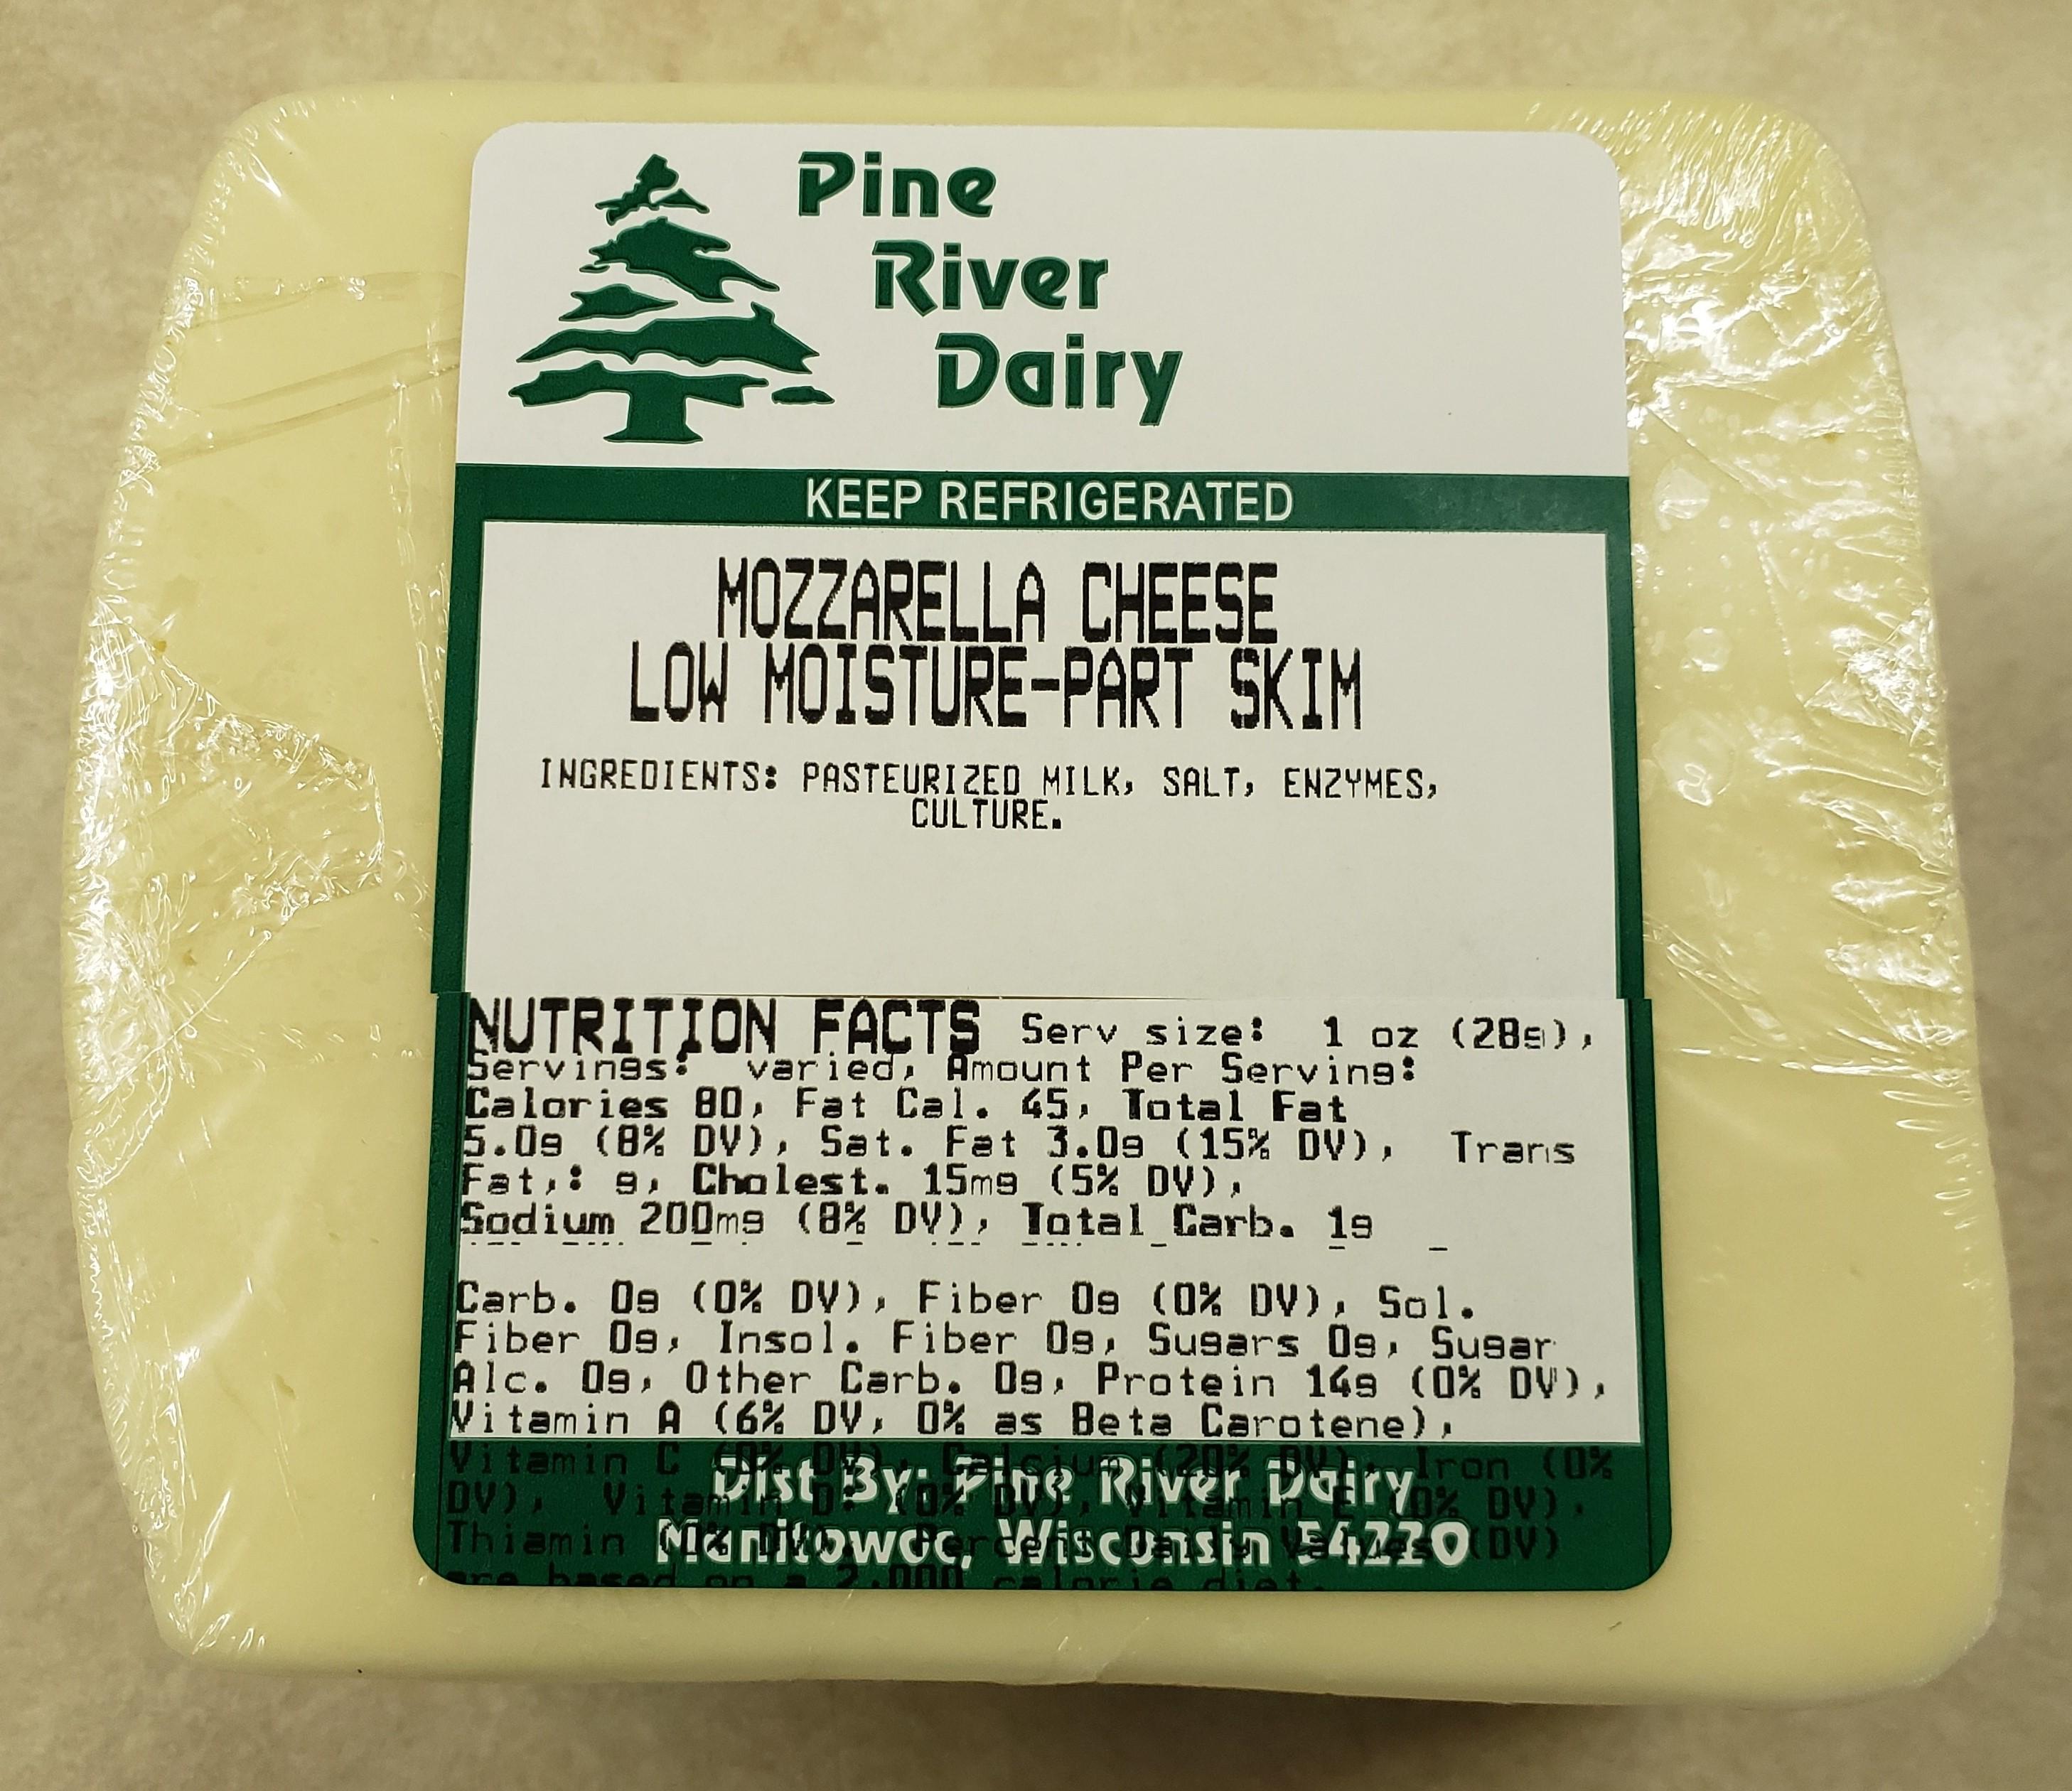 Mozzarella Low Moisture Part Skim